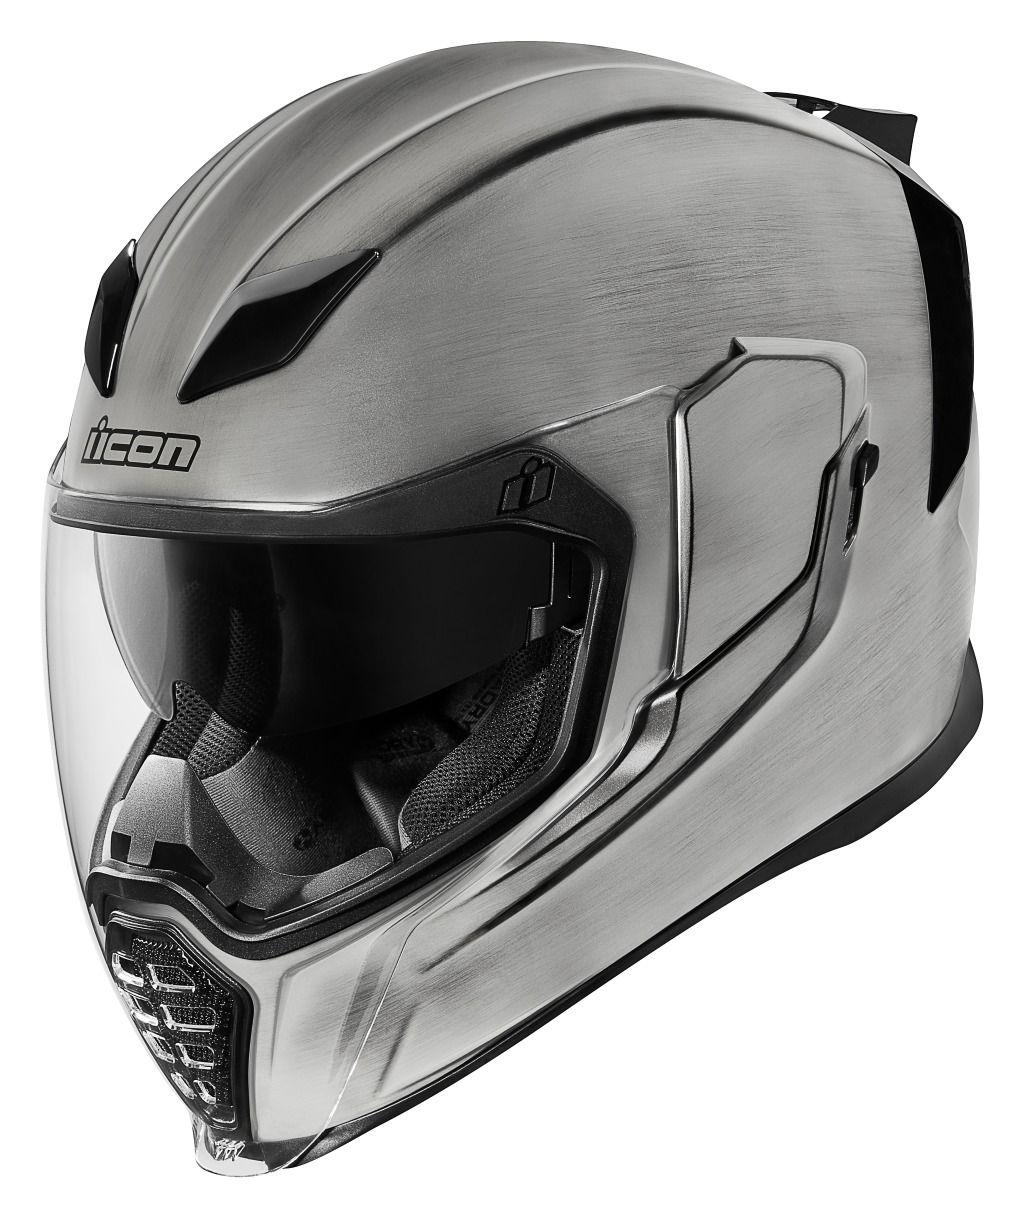 Icon Airflite Quicksilver Helmet Das Mechanica Pinterest Body Protector Inner Scoyco Am03 290 Optional Faceshield 40